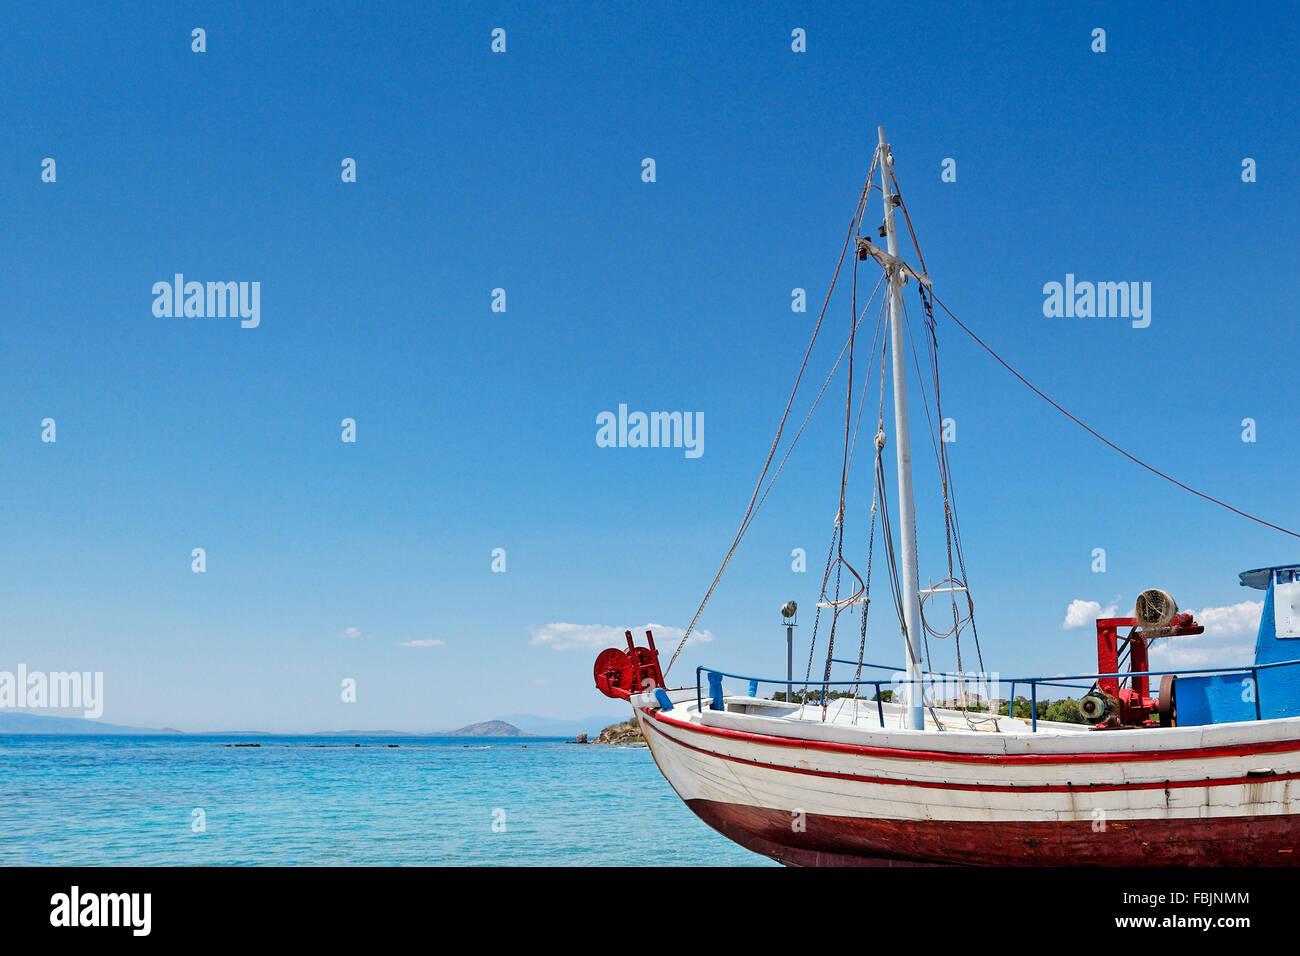 Traditionellen Fischerboot in Aegina Insel, Griechenland Stockbild